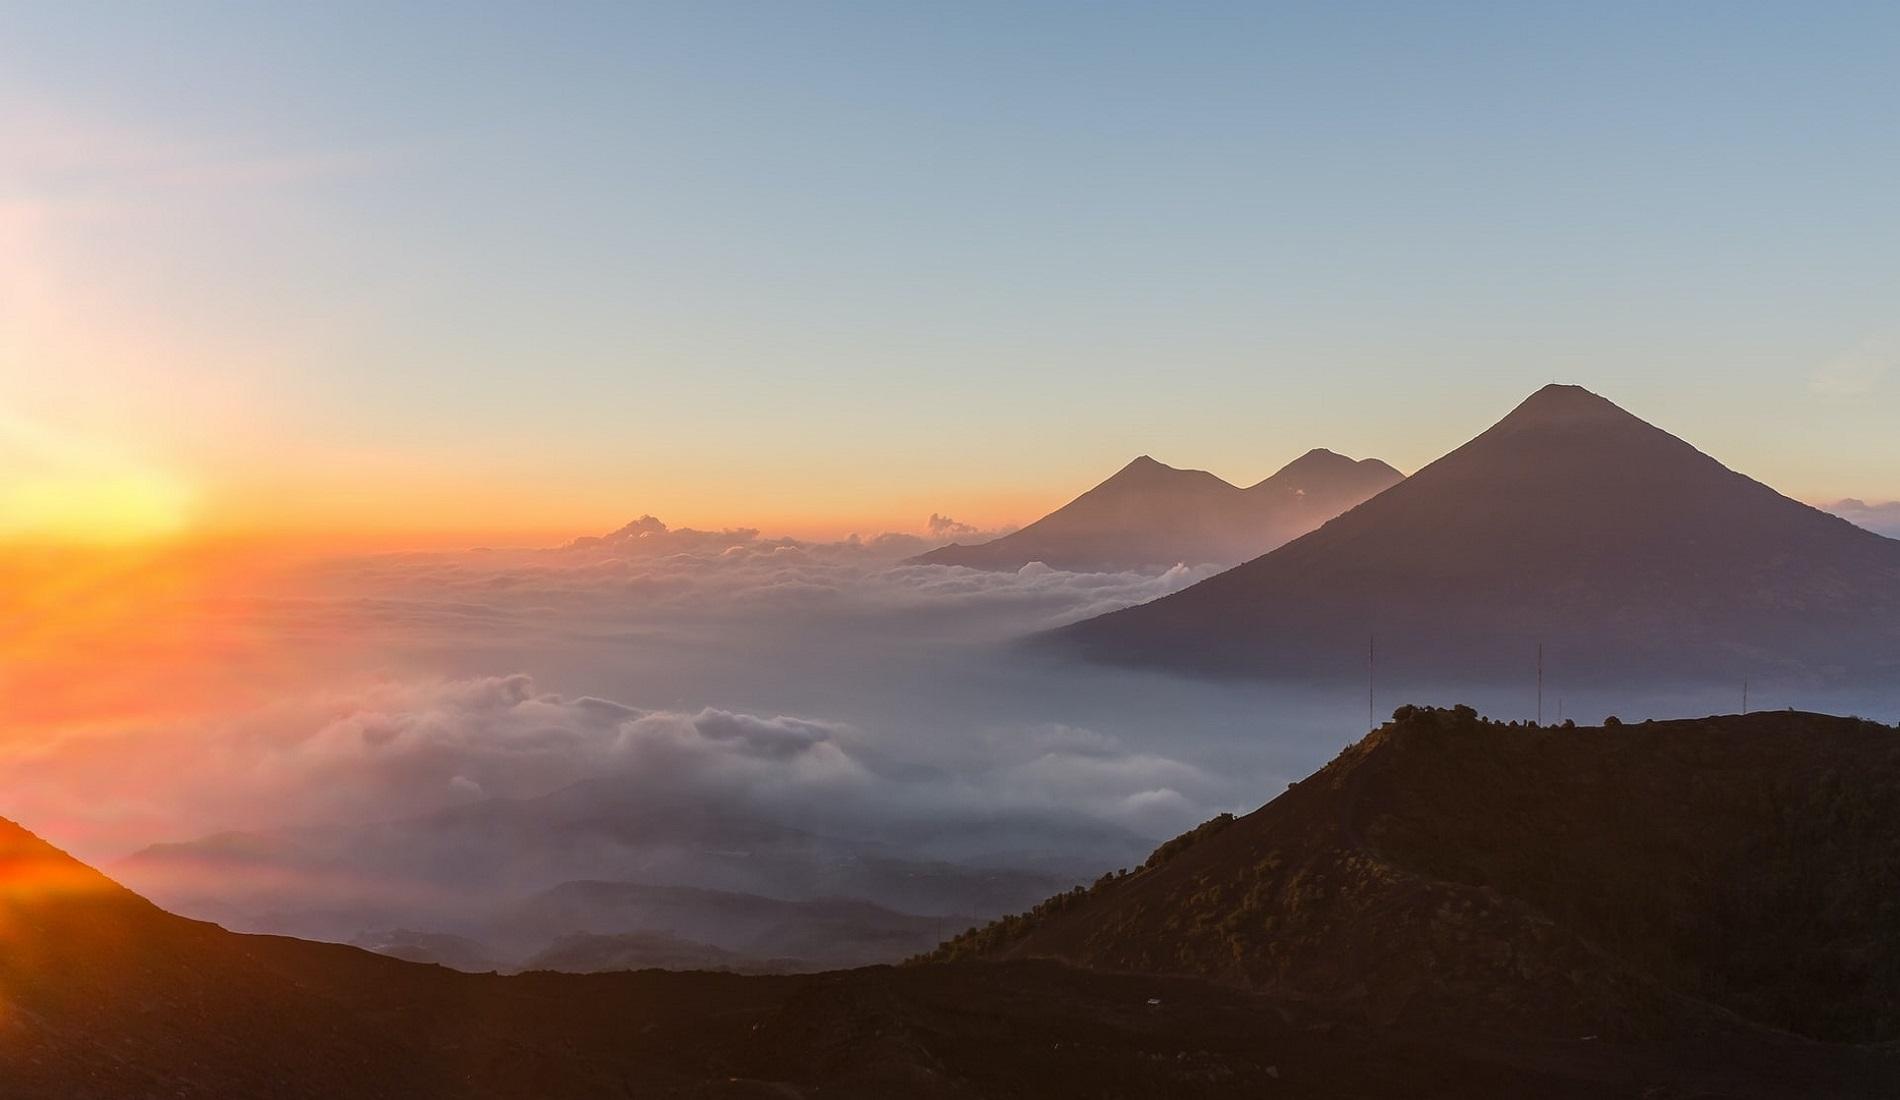 luxe reis guatemala Pacaya vulkaan zicht op Acatenango en agua vulkaan